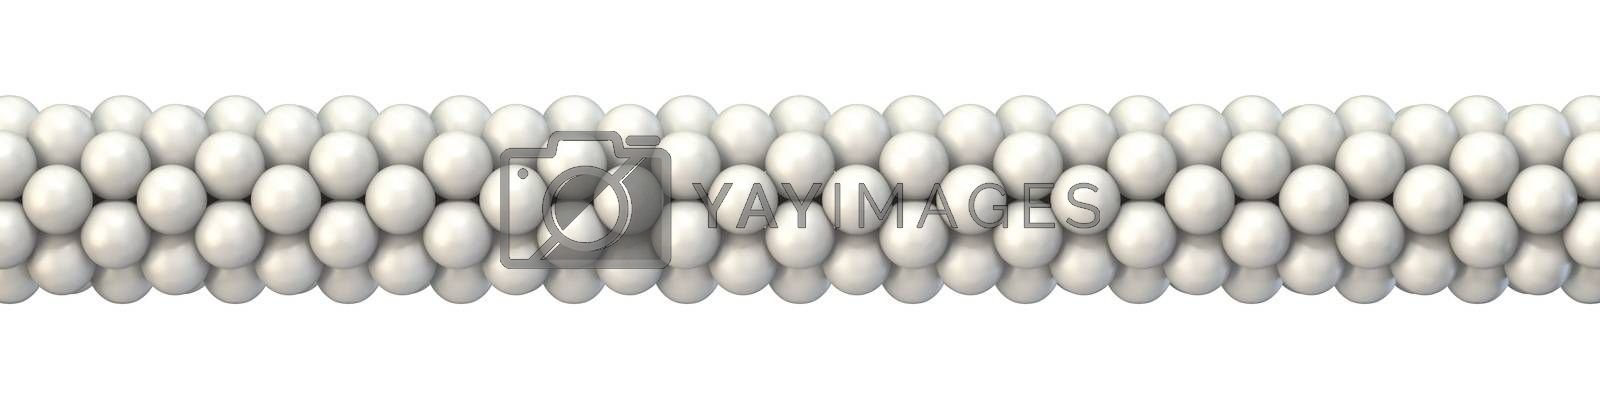 White balloons decoration 3D render illustration isolated on white background